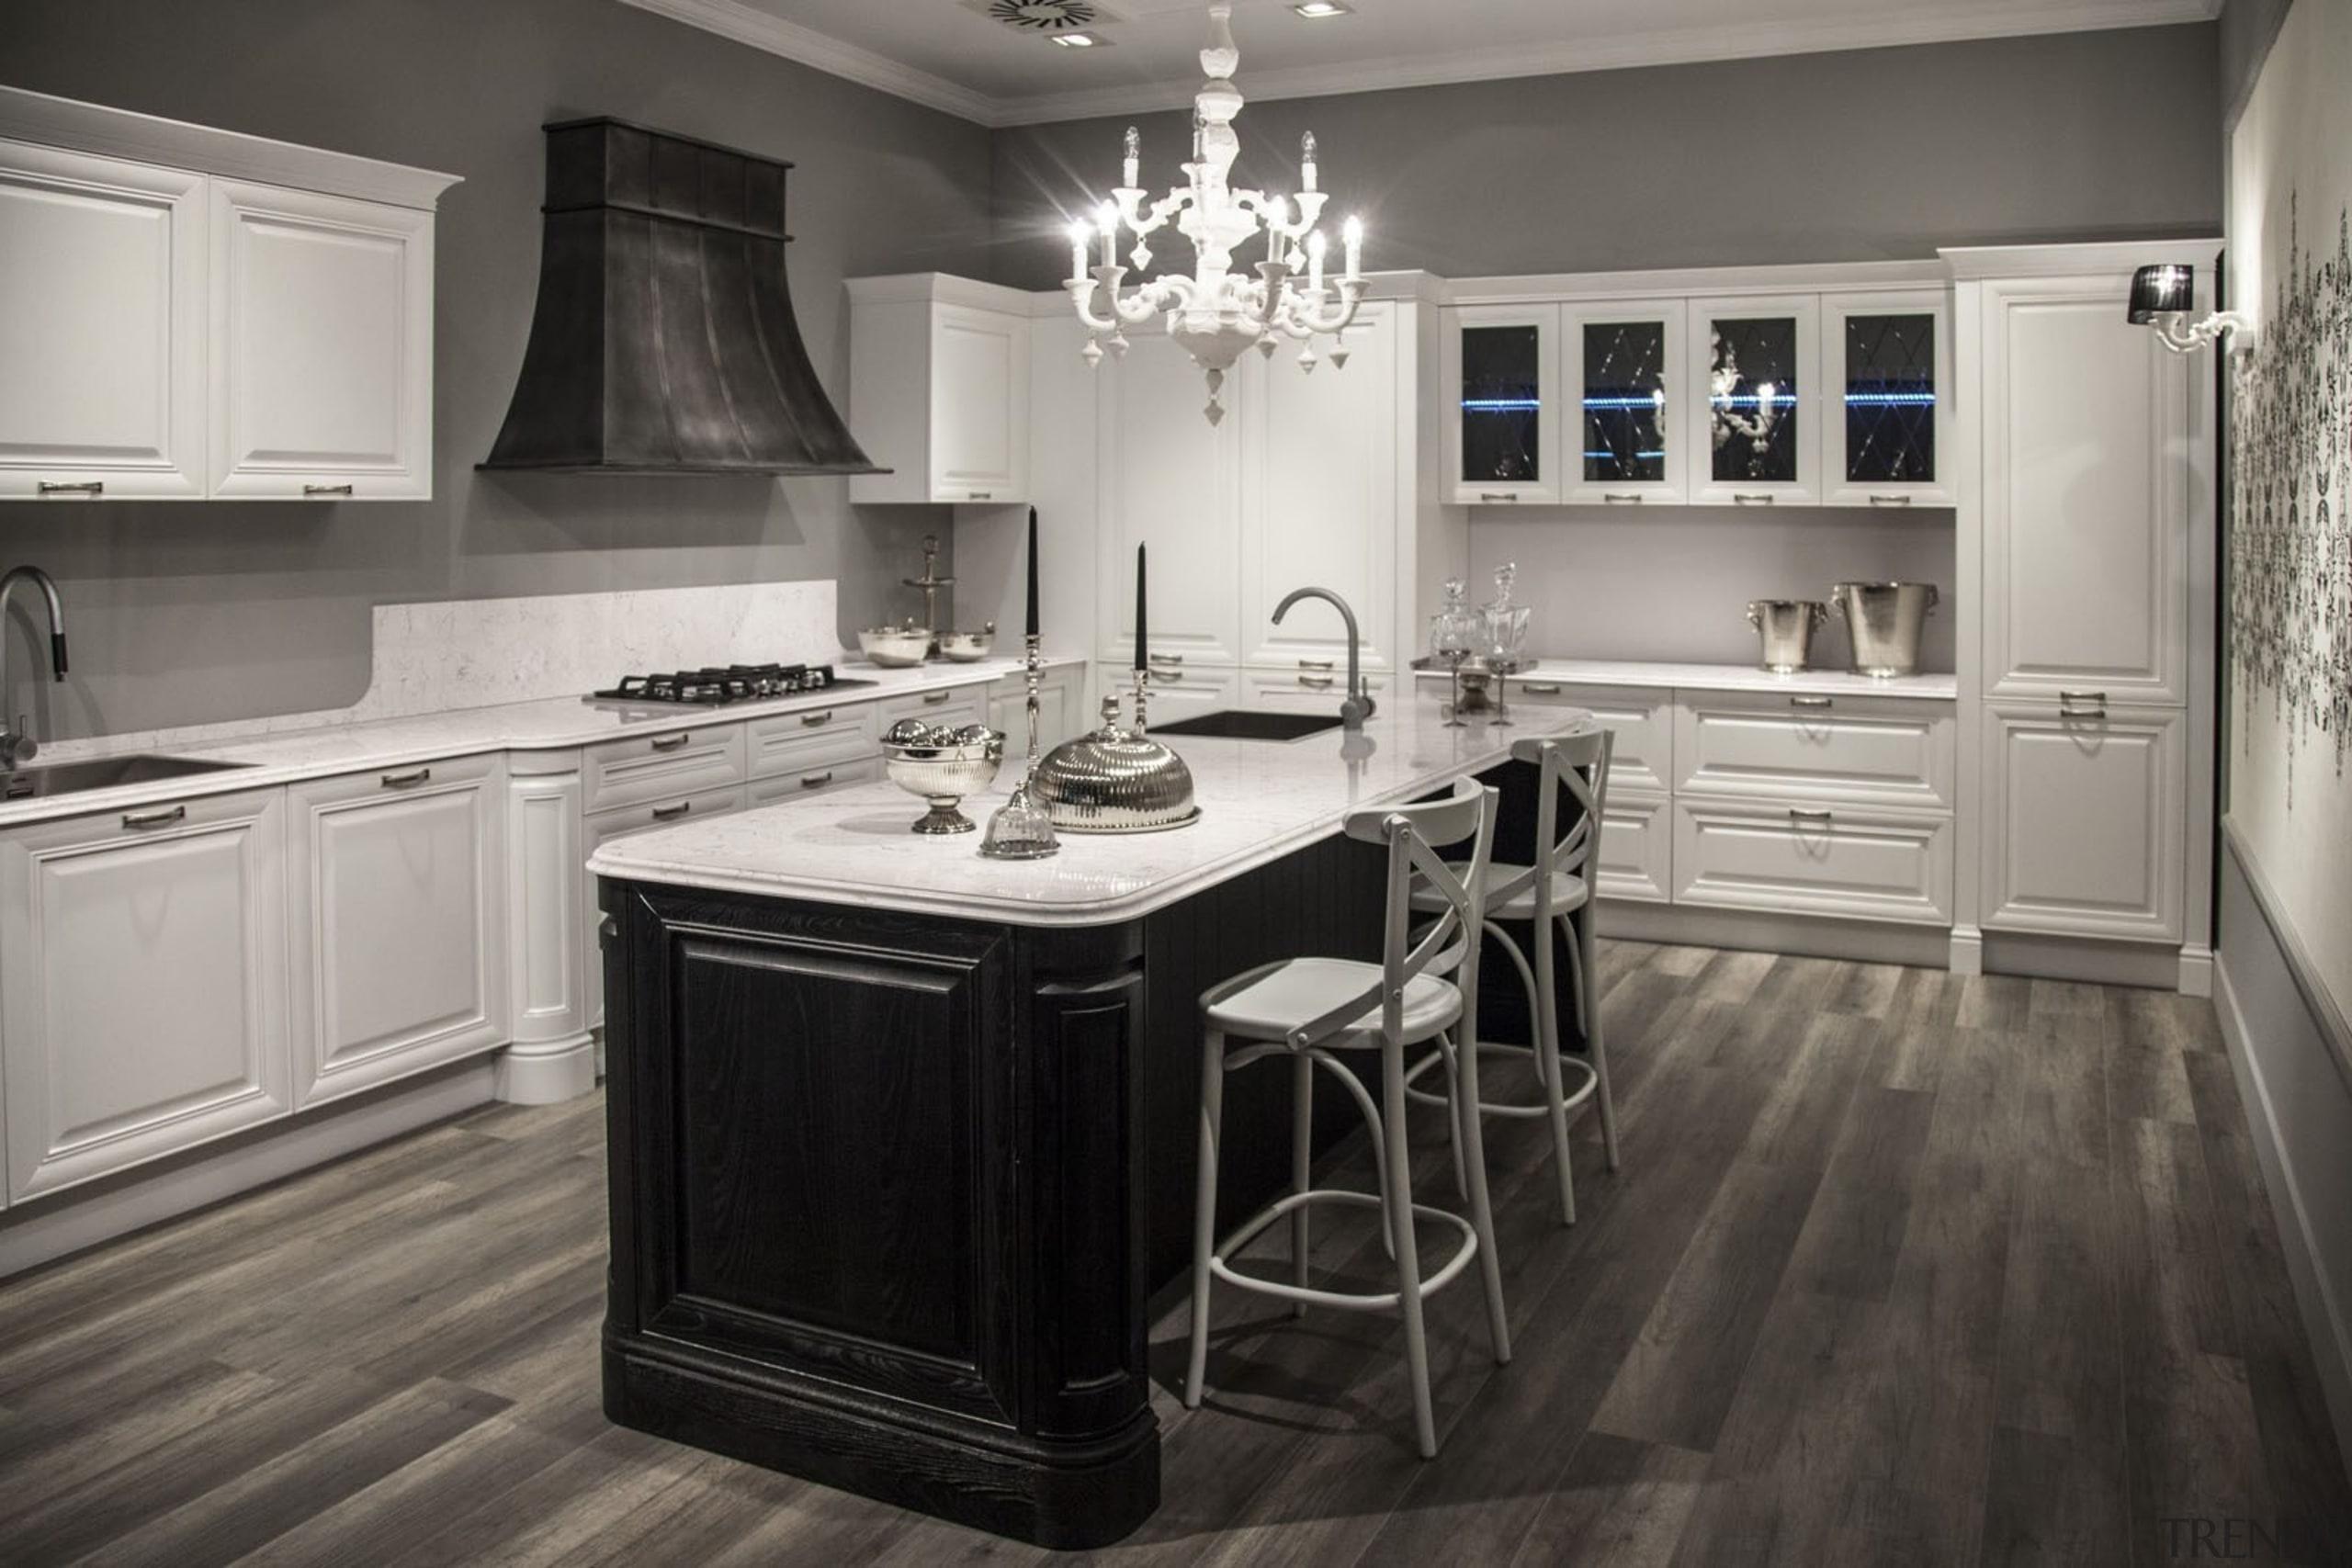 Snowy Ibiza - Kichen - Snowy Ibiza - cabinetry, countertop, cuisine classique, floor, flooring, hardwood, interior design, kitchen, room, wood flooring, gray, black